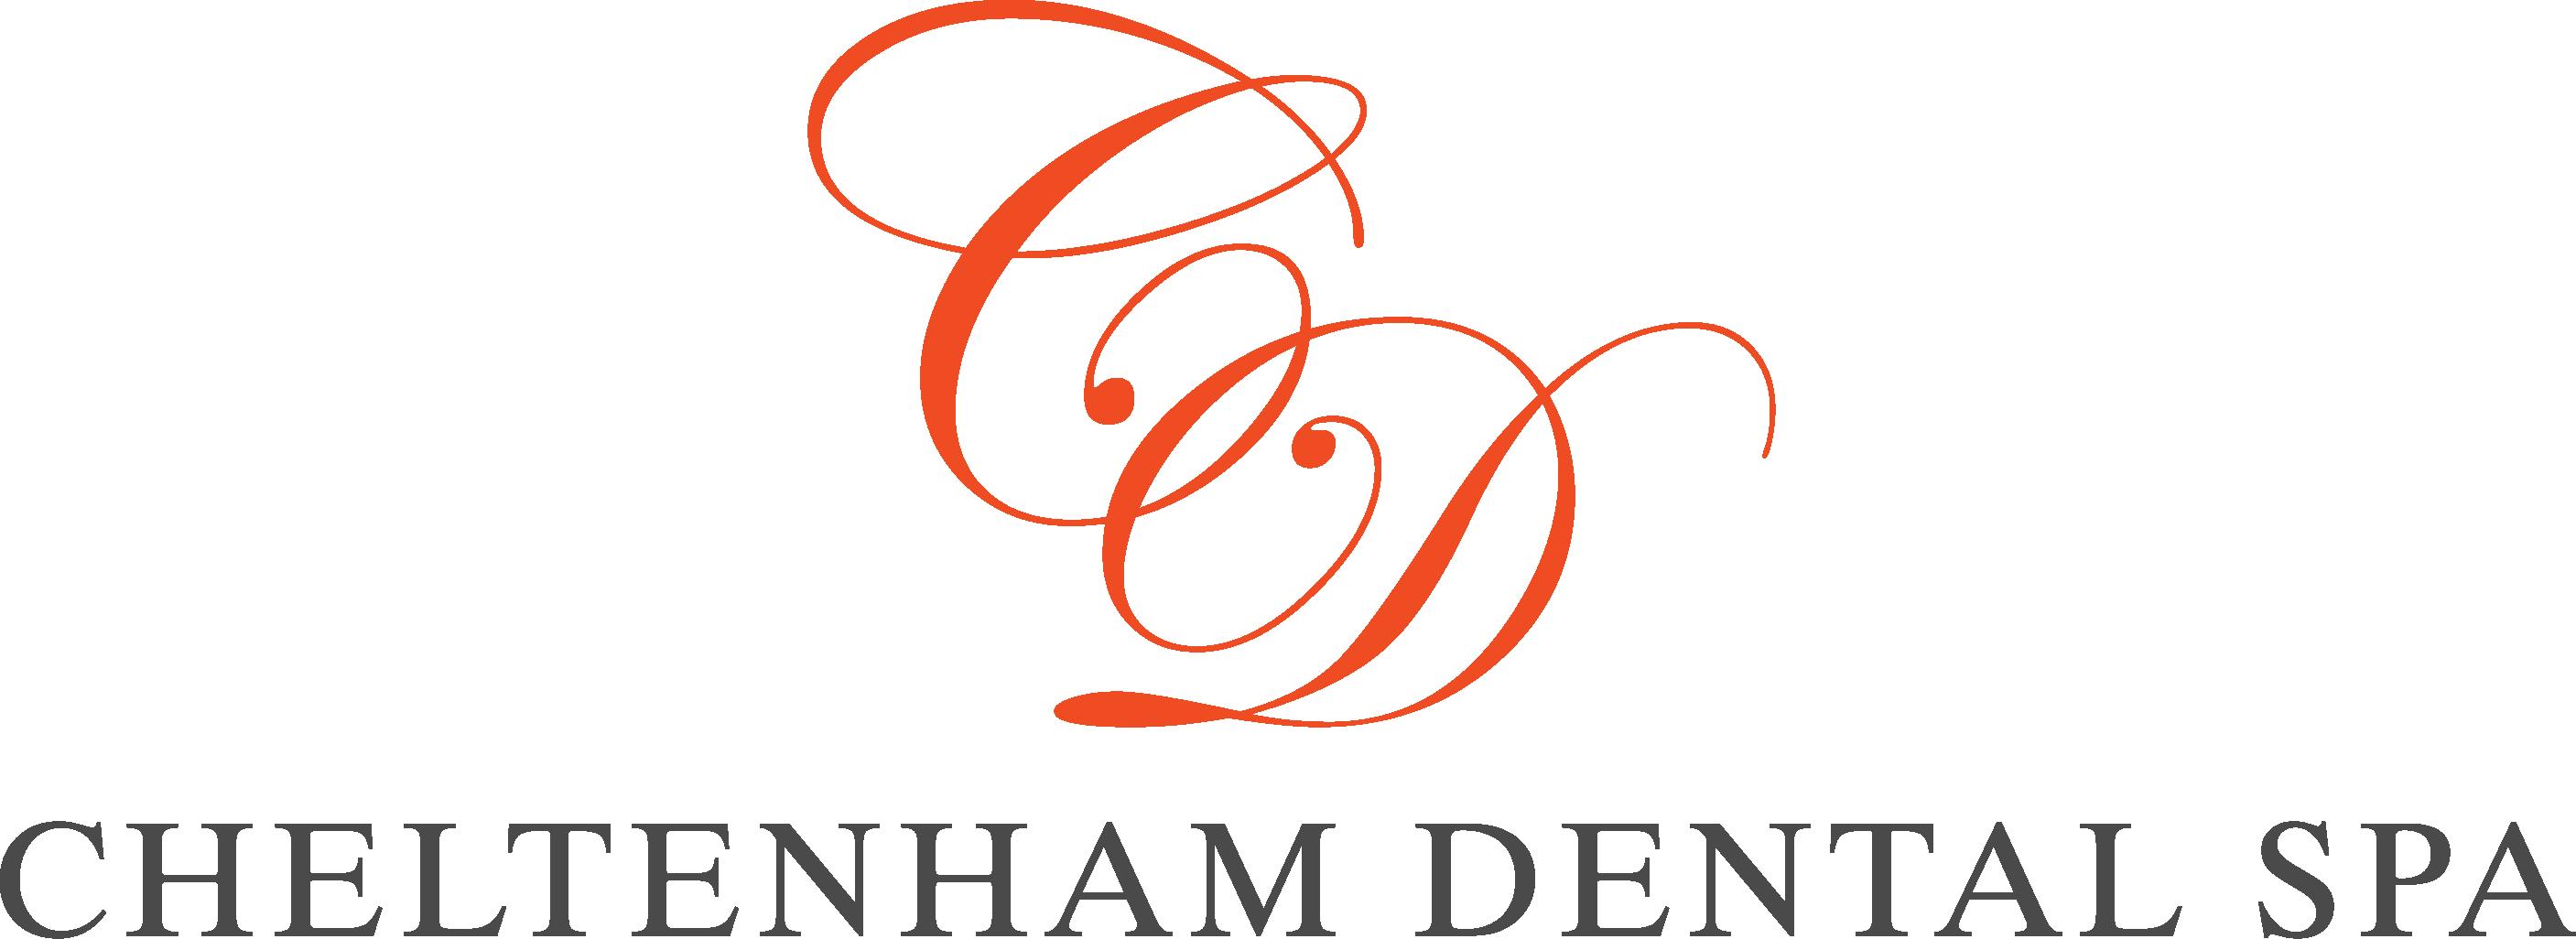 Cheltenham Dental Spa